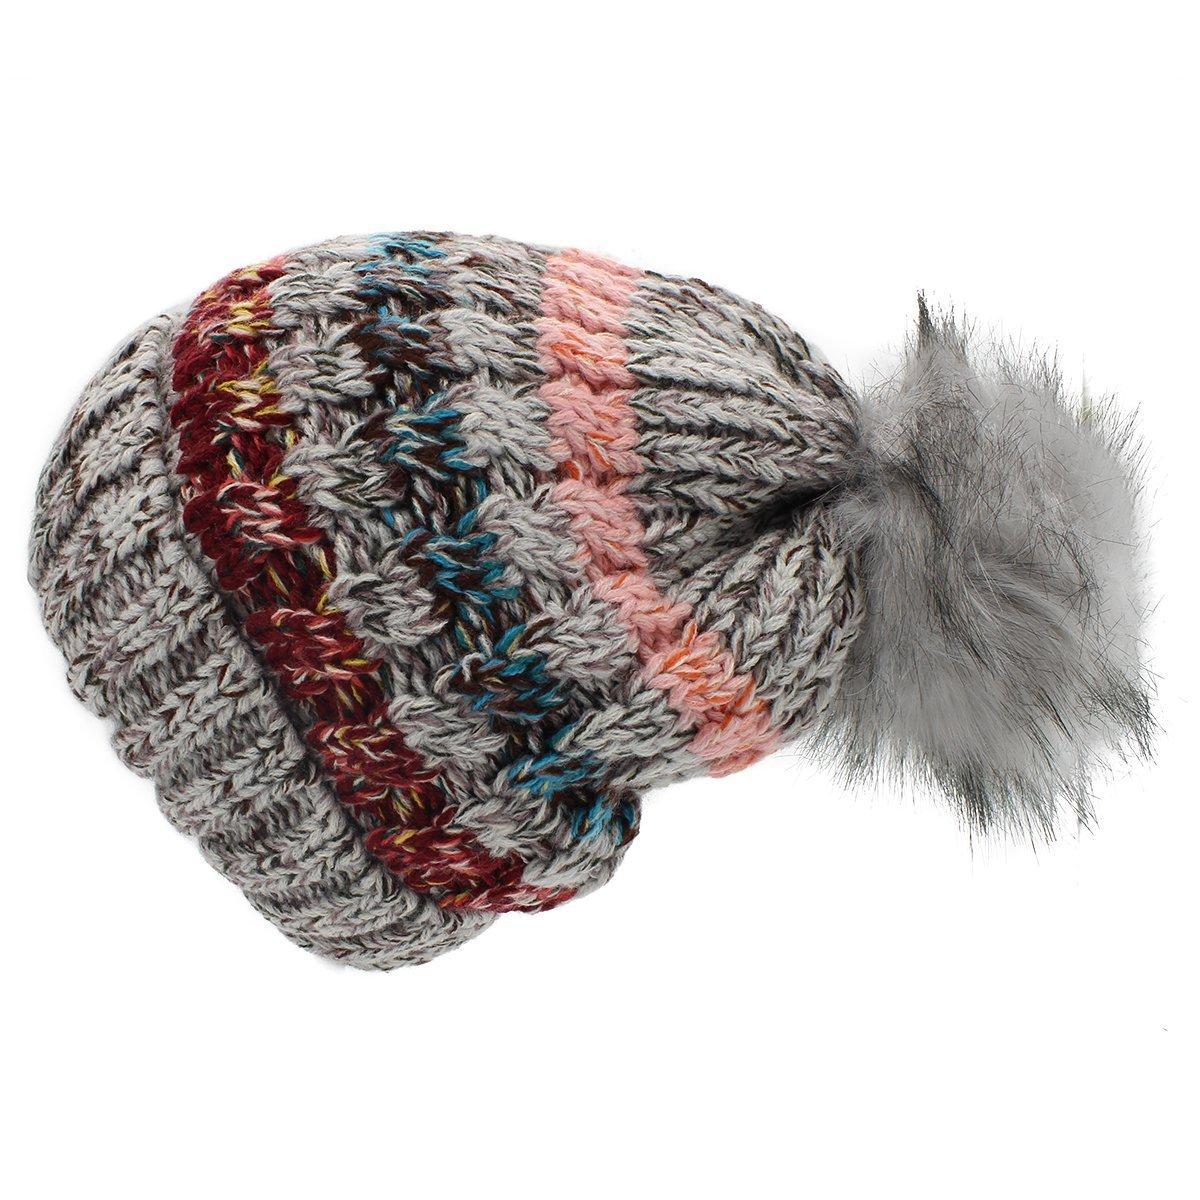 Ronlin Women Winter Knit Beanie Hat - Winter Women Hat with Big Pom Pom Ski  Caps at Amazon Women s Clothing store  89e15a30851